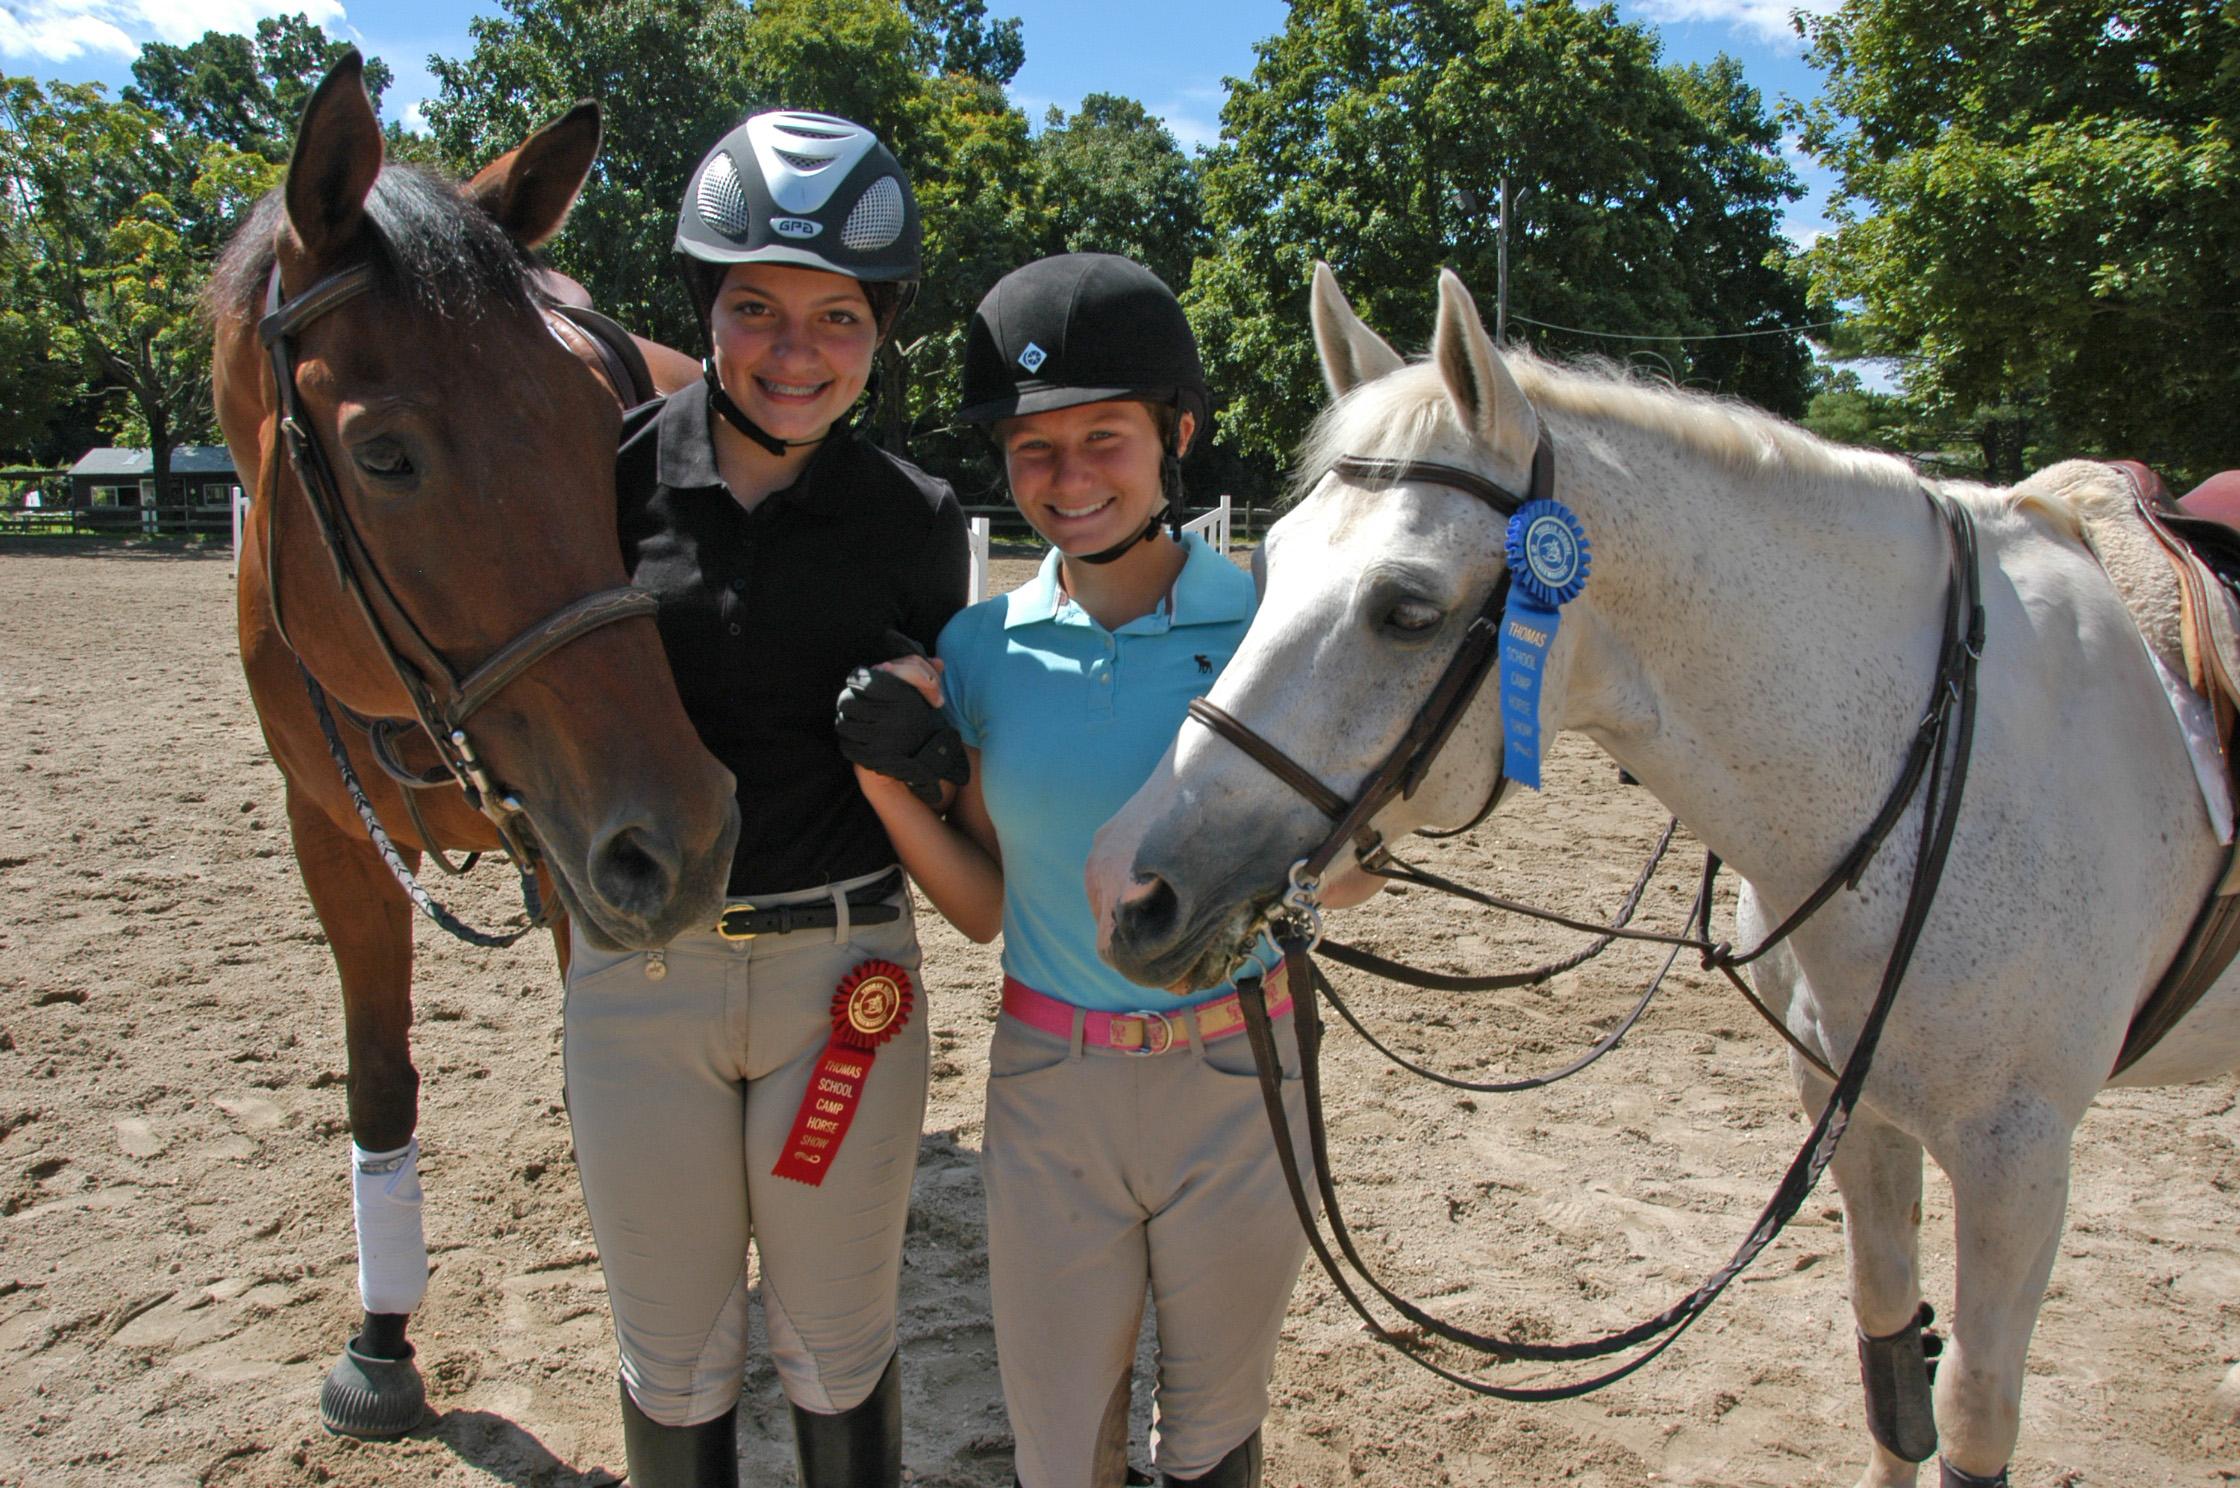 Thomas School of Horsemanship Summer Day Camp & Riding School image 7